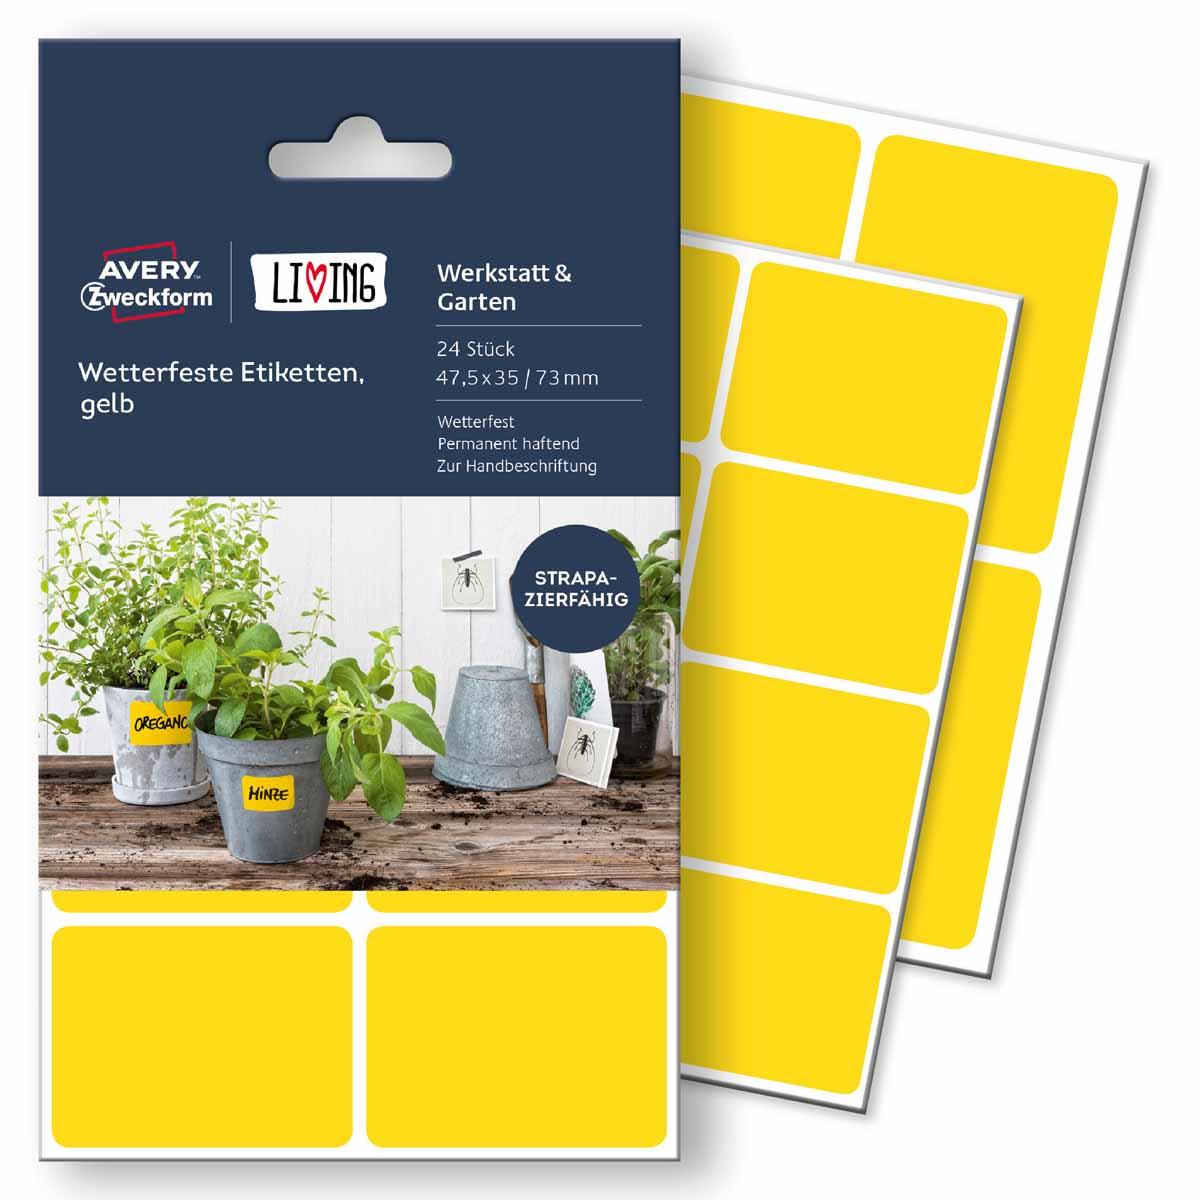 Avery Zweckform Этикетки для дома Living 47,5 х 35 мм цвет желтый жидкость для удаления этикеток avery zweckform спрей 150 мл